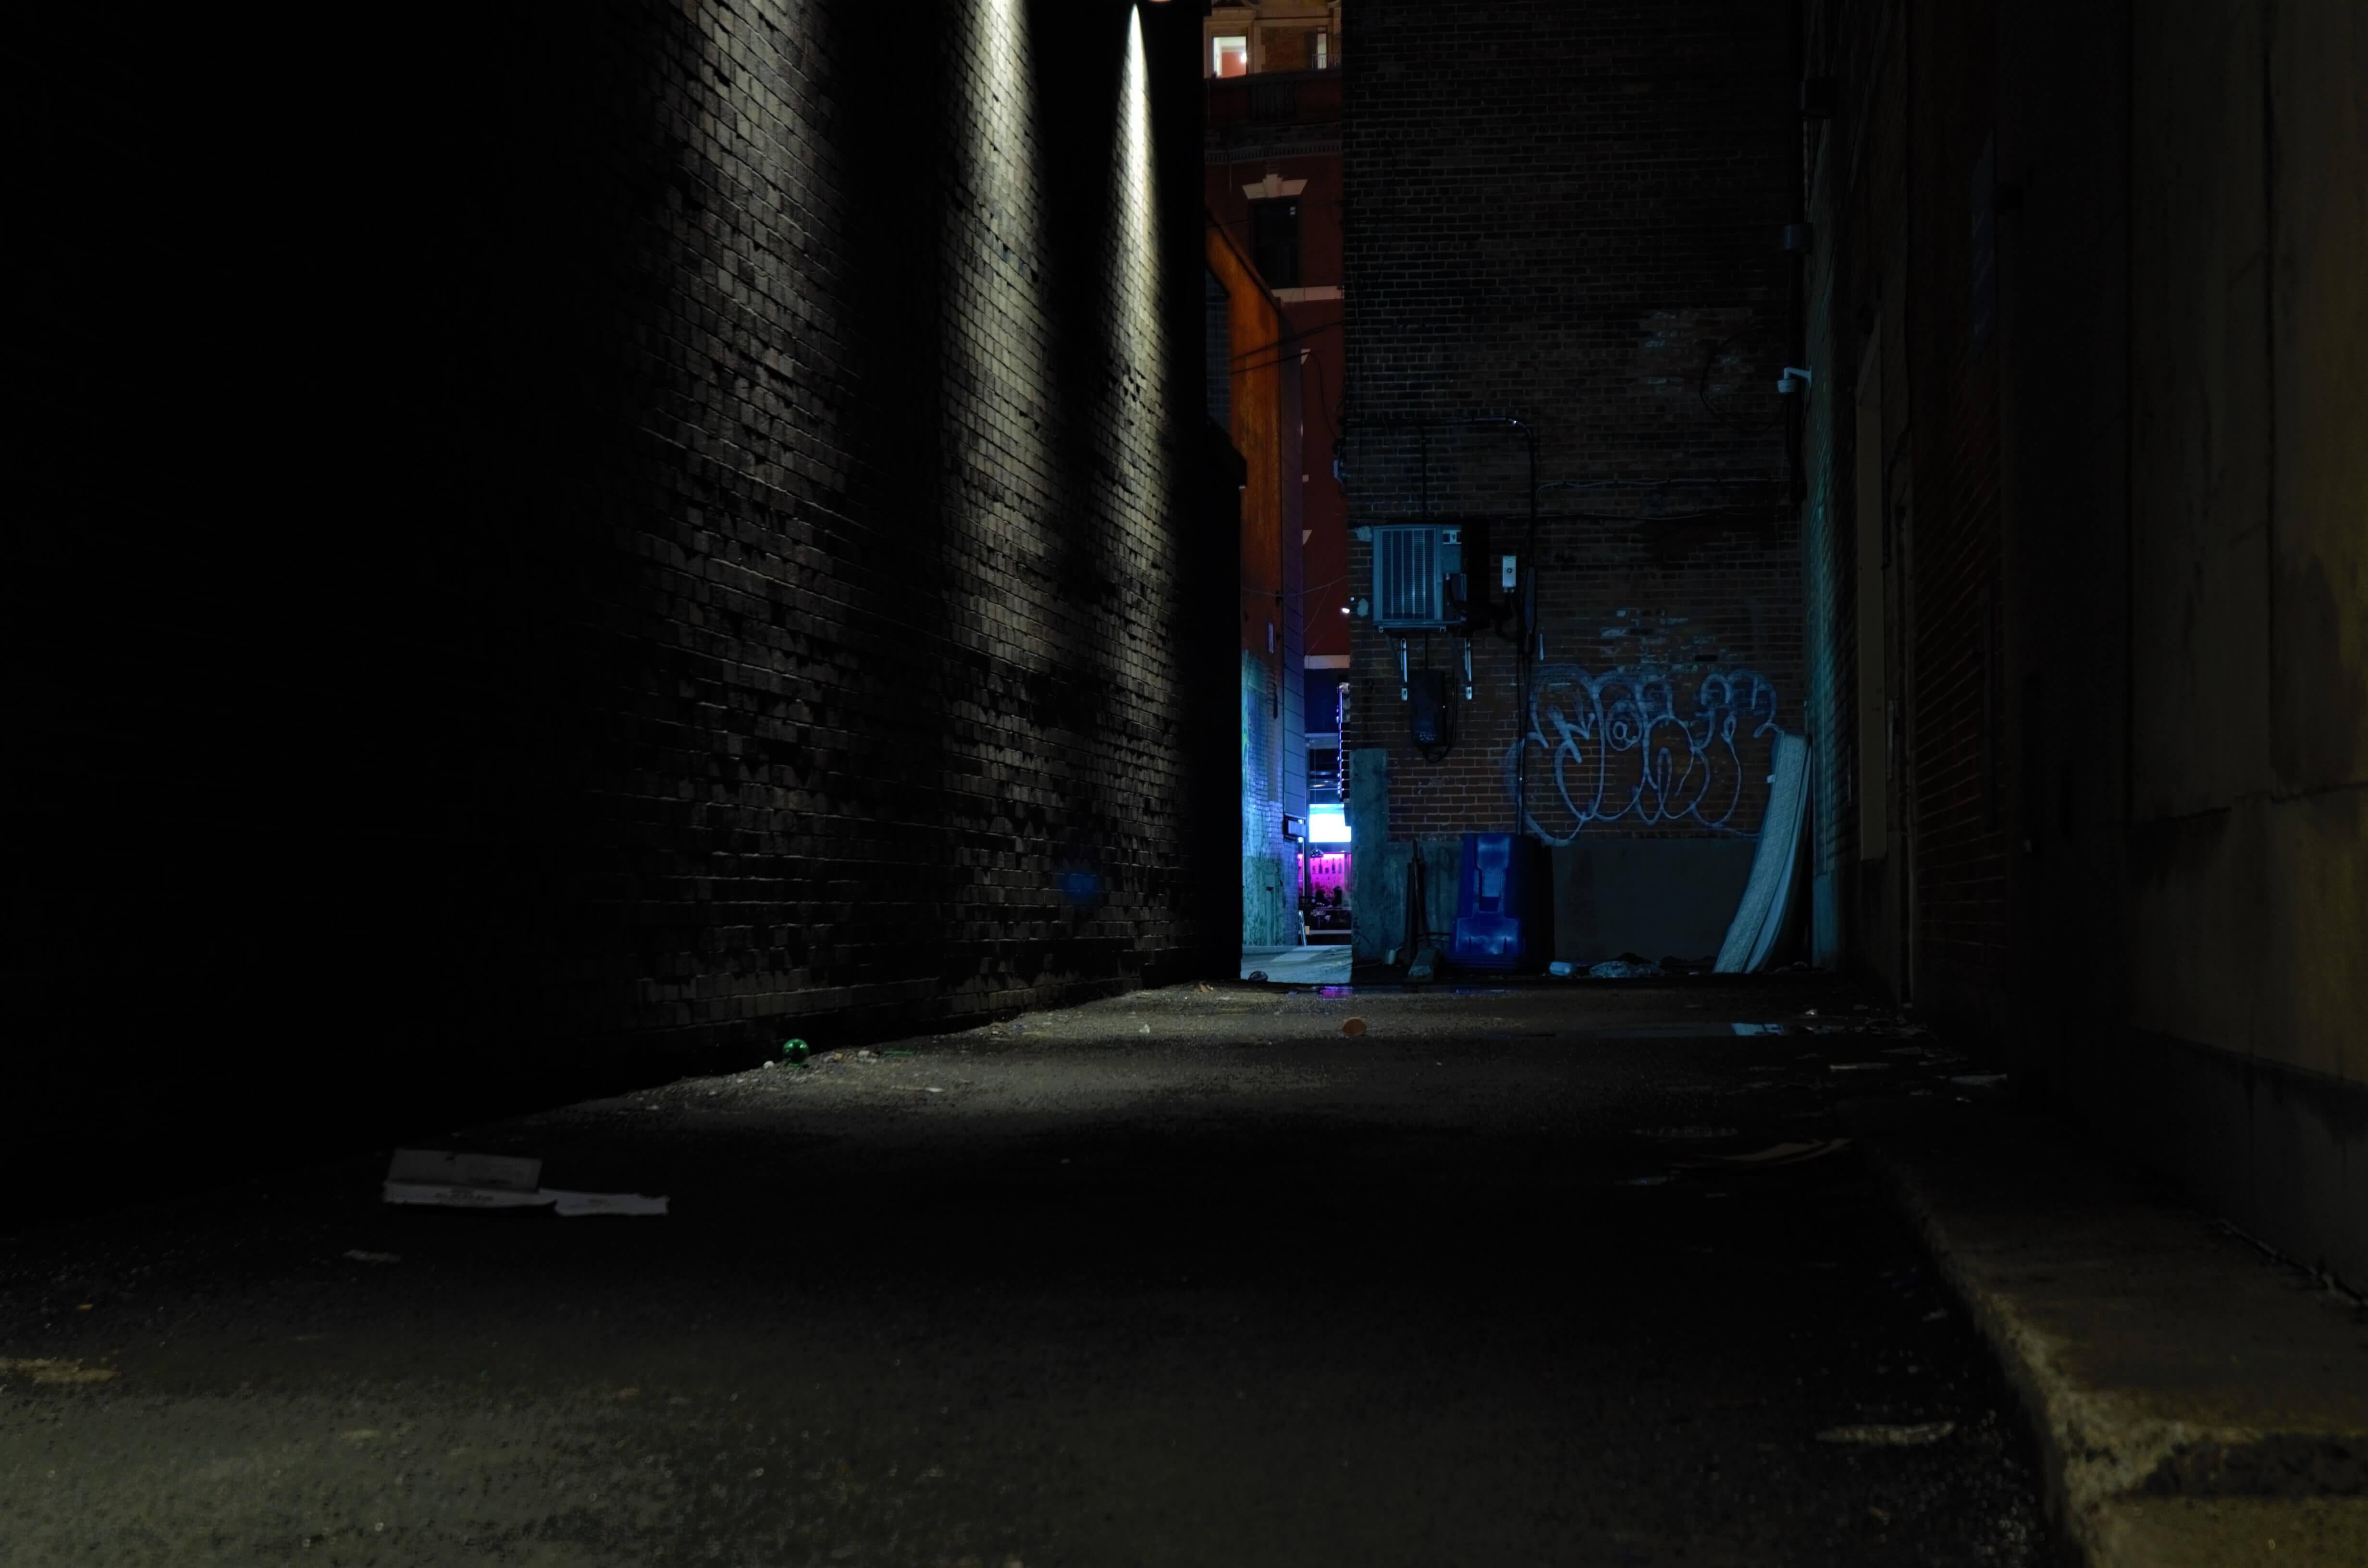 A dim, dark alleyway